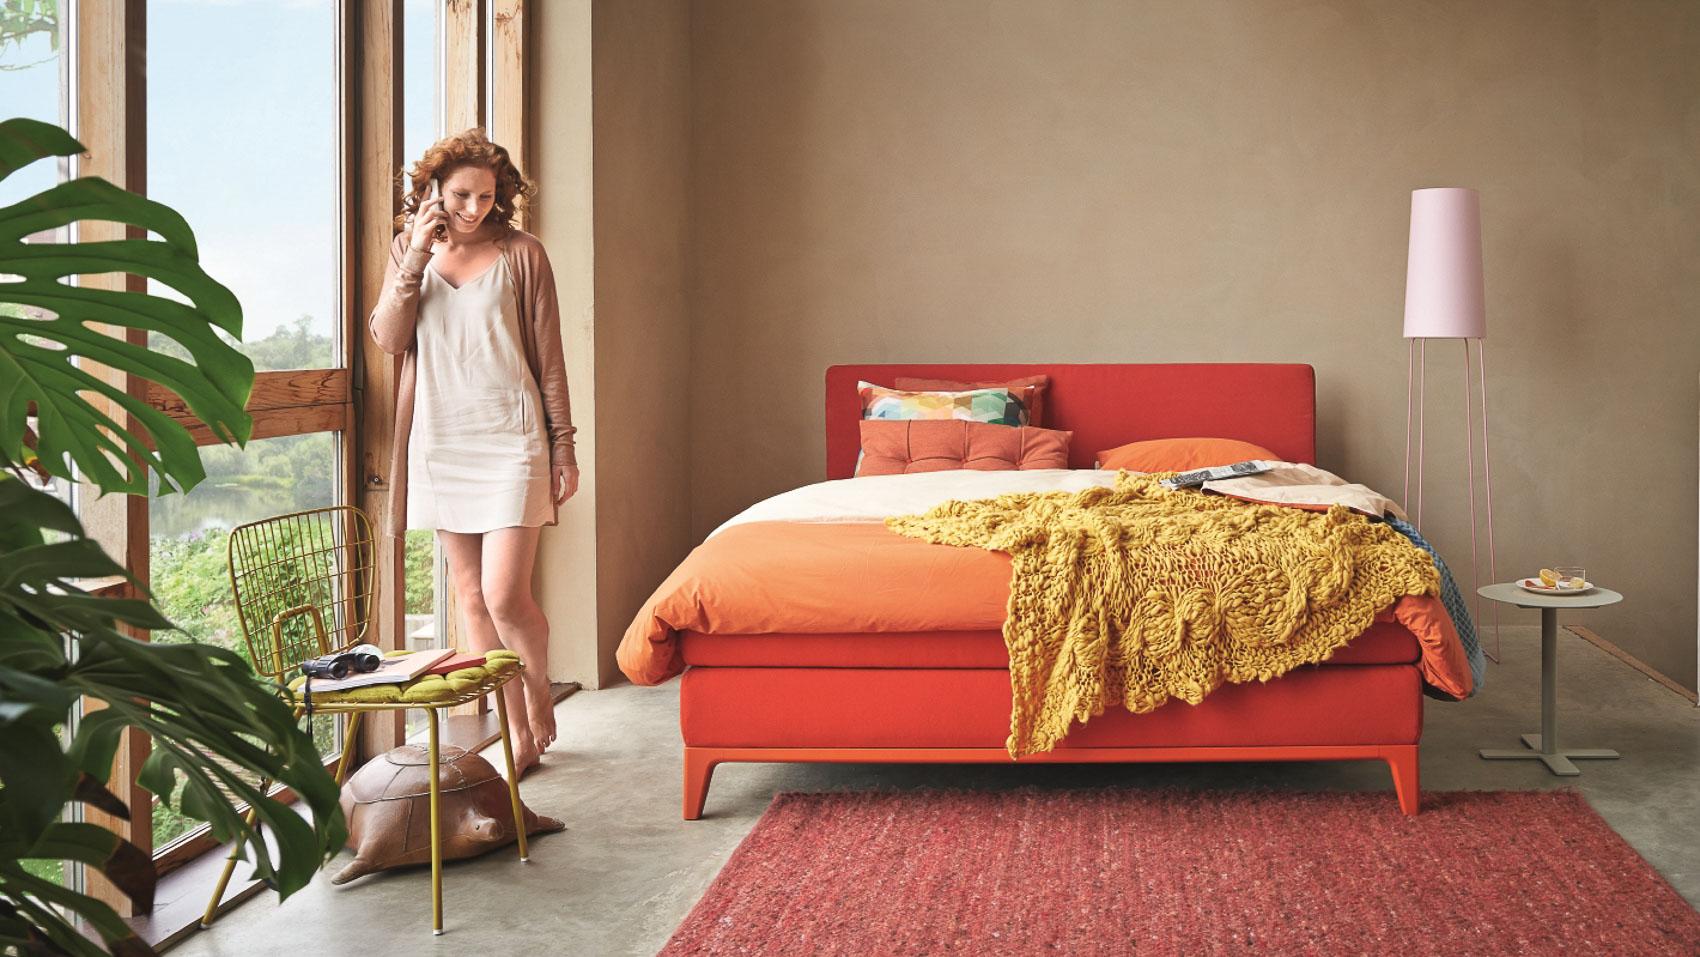 criade plain boxspringbett auping schlafzimmer und bettenhaus k rner co gmbh in n rnberg. Black Bedroom Furniture Sets. Home Design Ideas